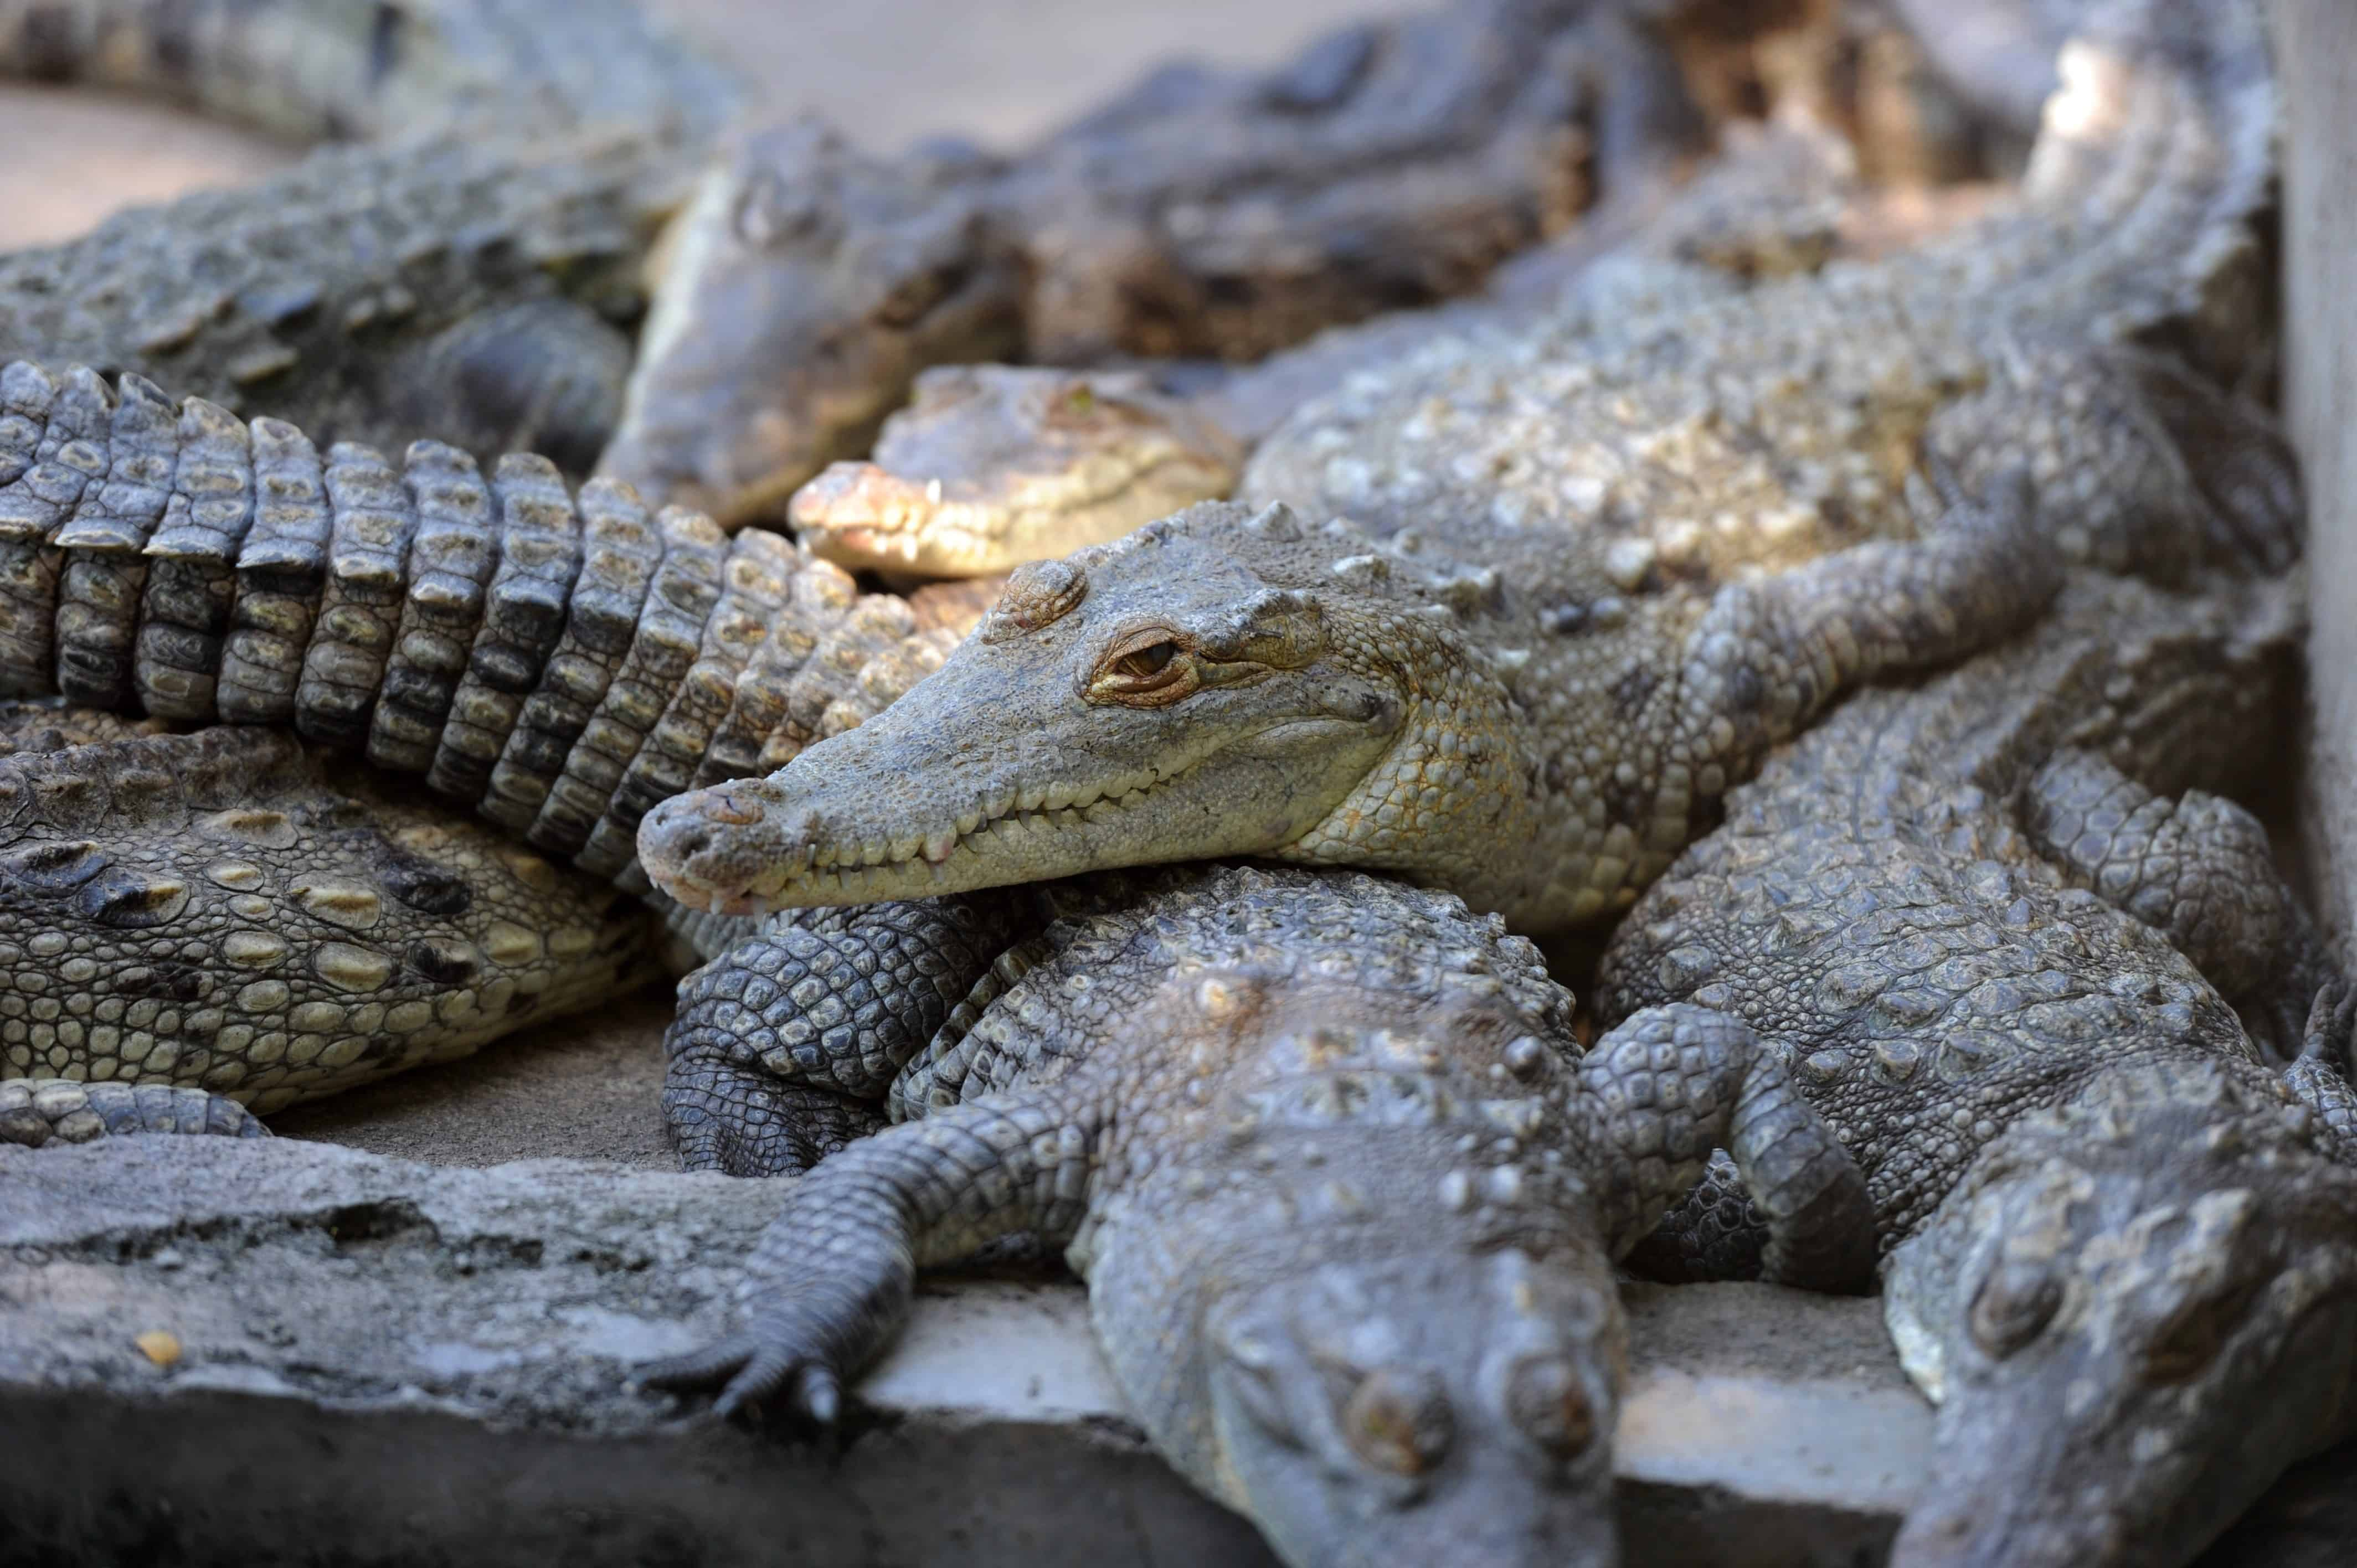 Honduras crocodiles